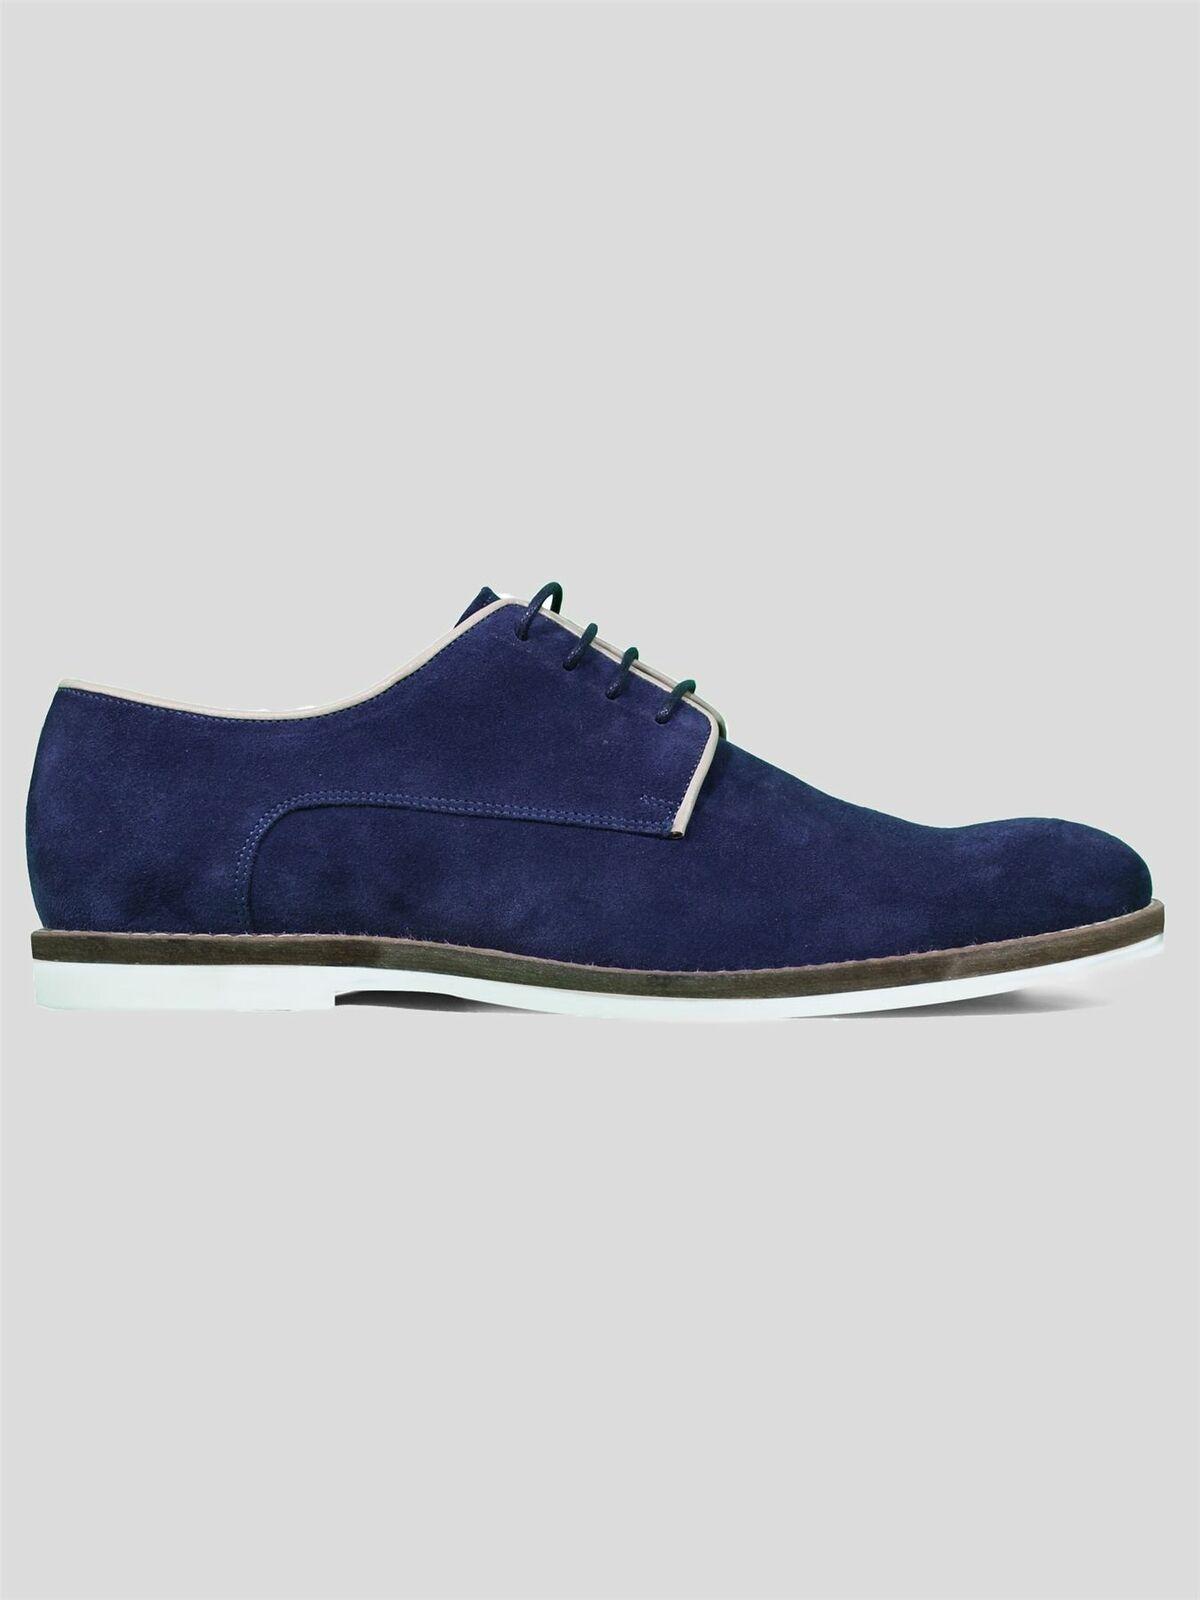 7fc5742a7f6 Luke 1977 Mens GOBI SUEDE DERBY SHOE nvrmbm21-Casual Shoes - www ...